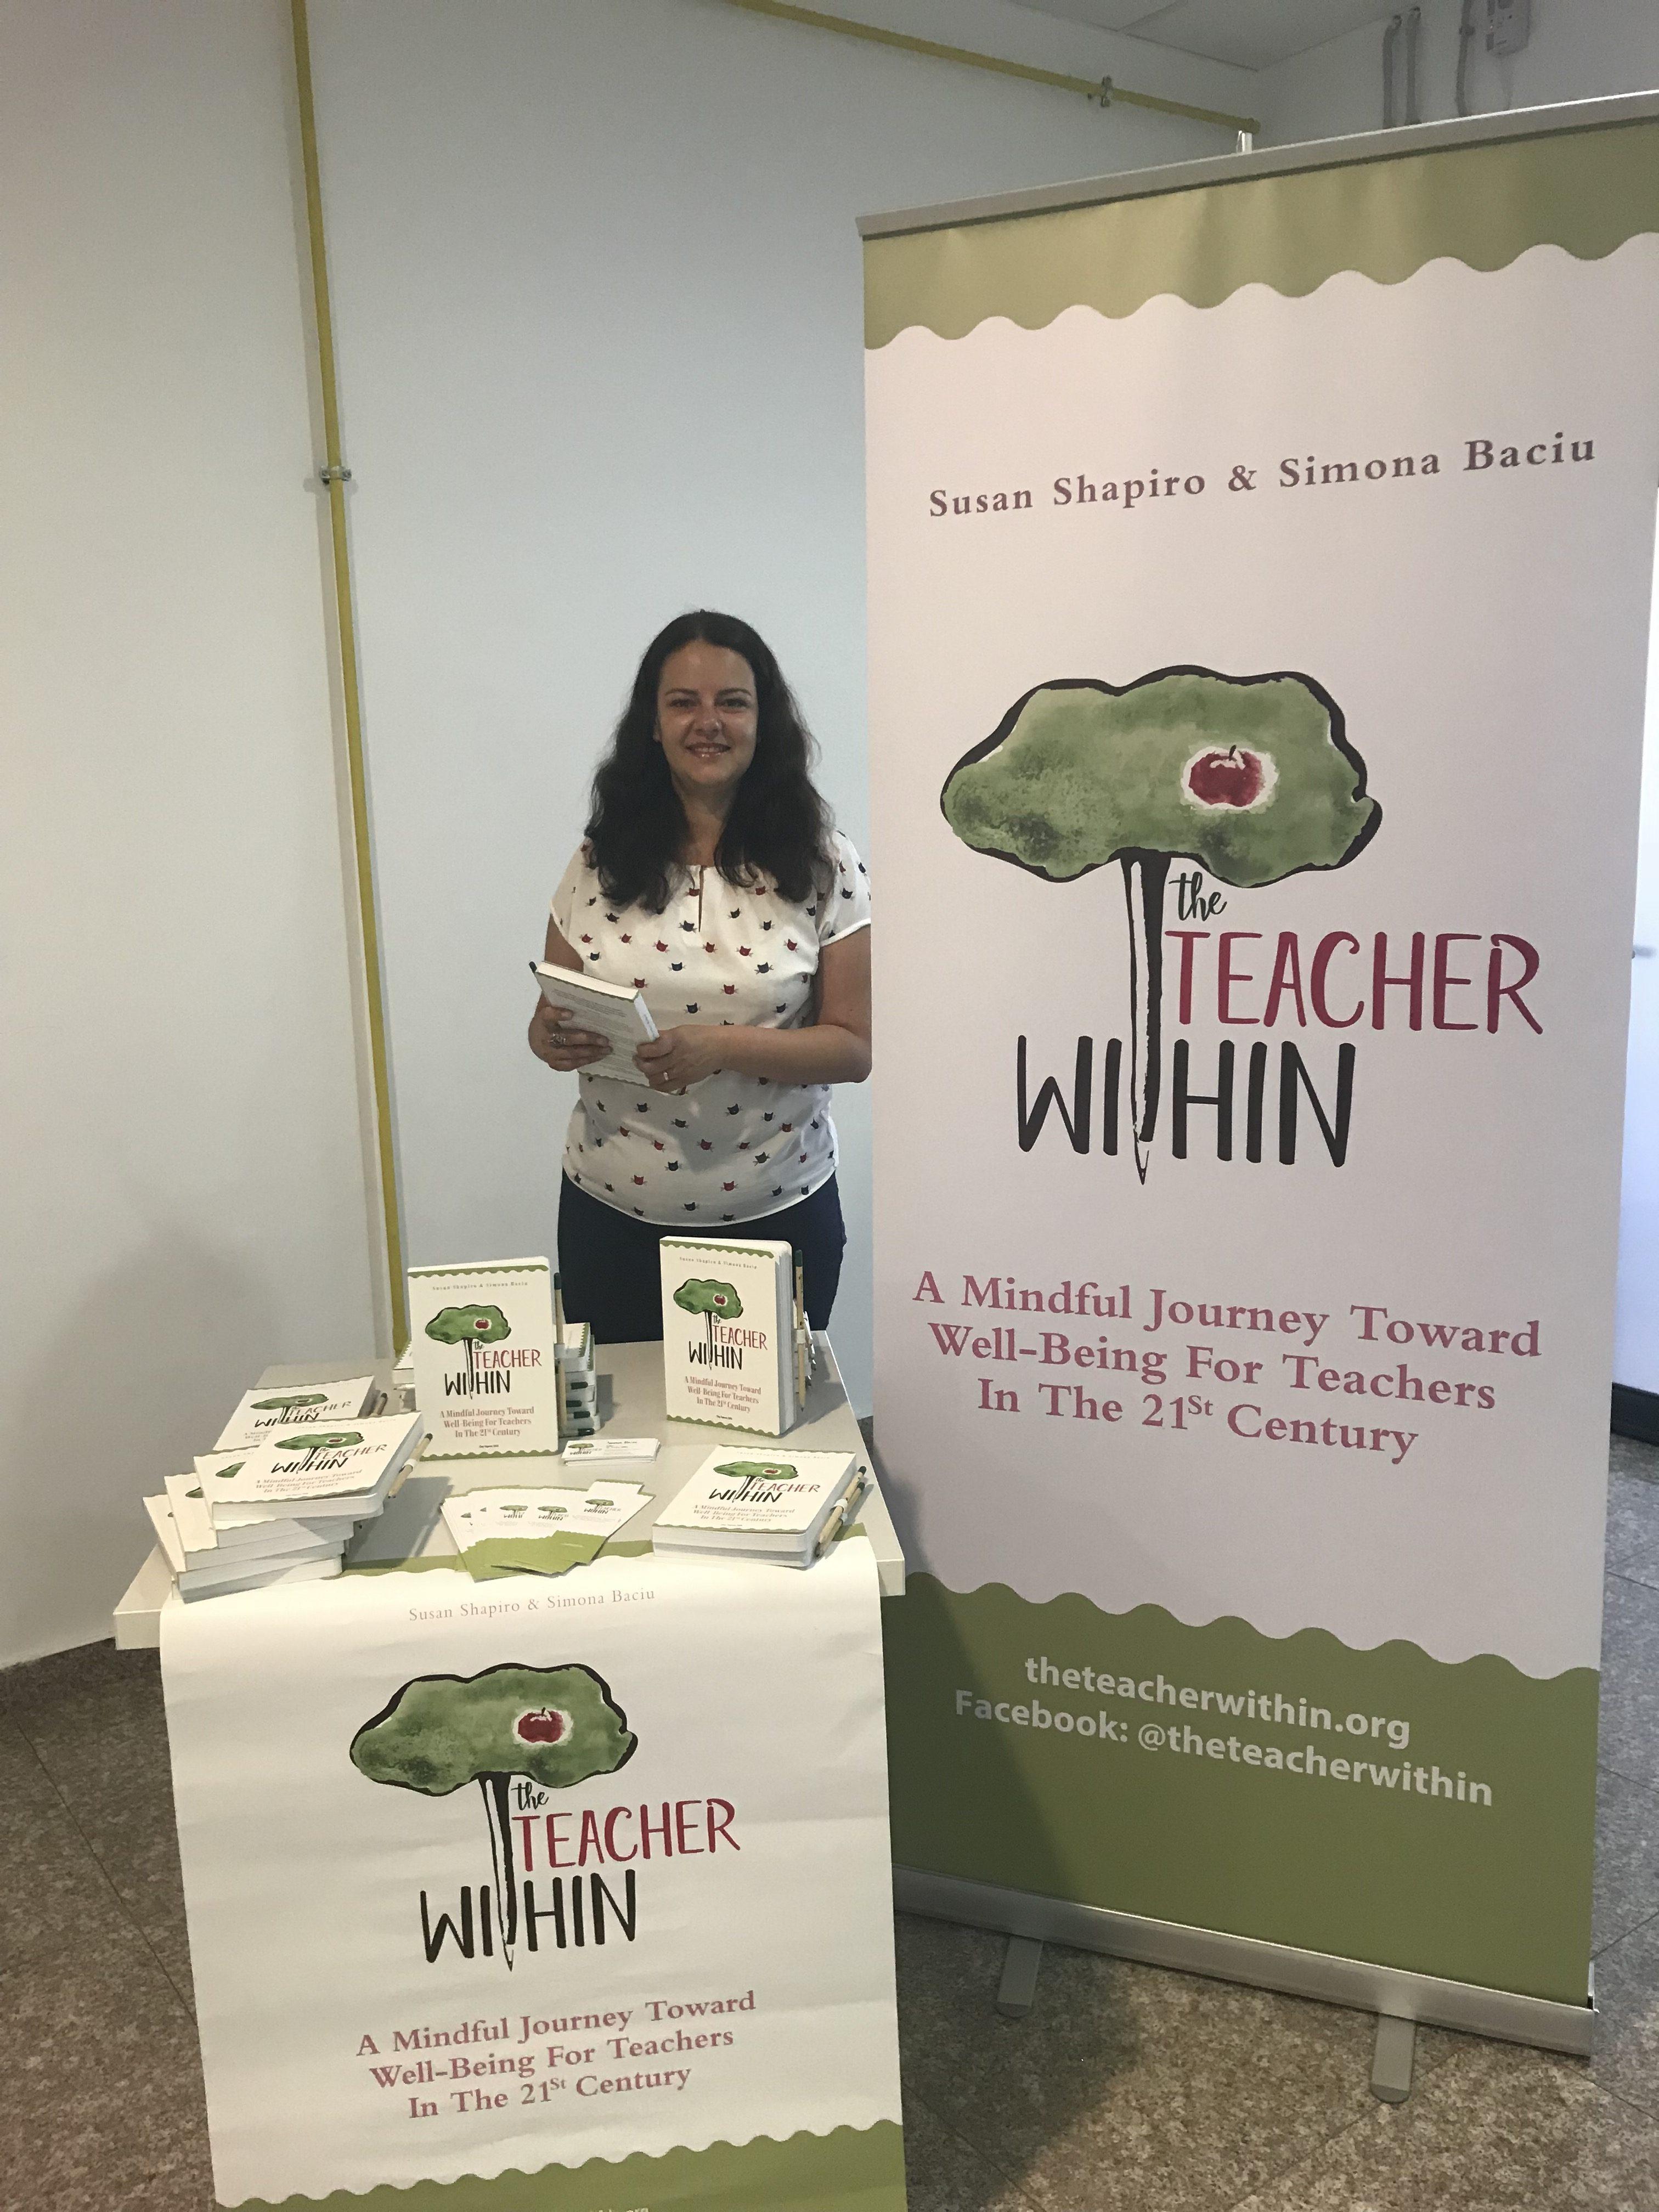 The Teacher Within